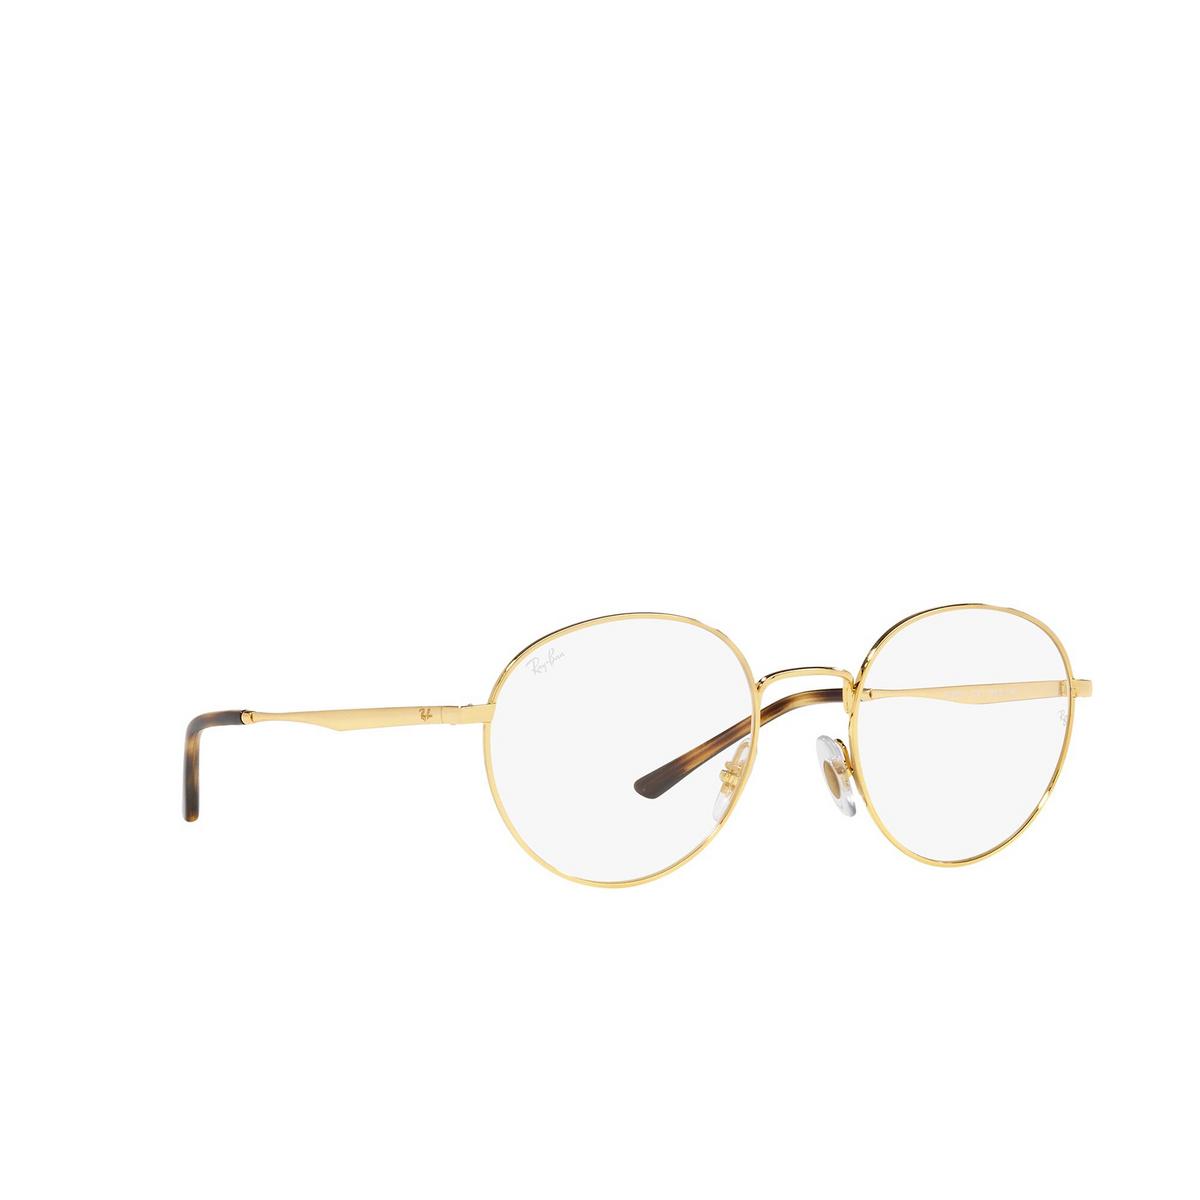 Ray-Ban® Round Eyeglasses: RX3681V color Arista 2500 - three-quarters view.